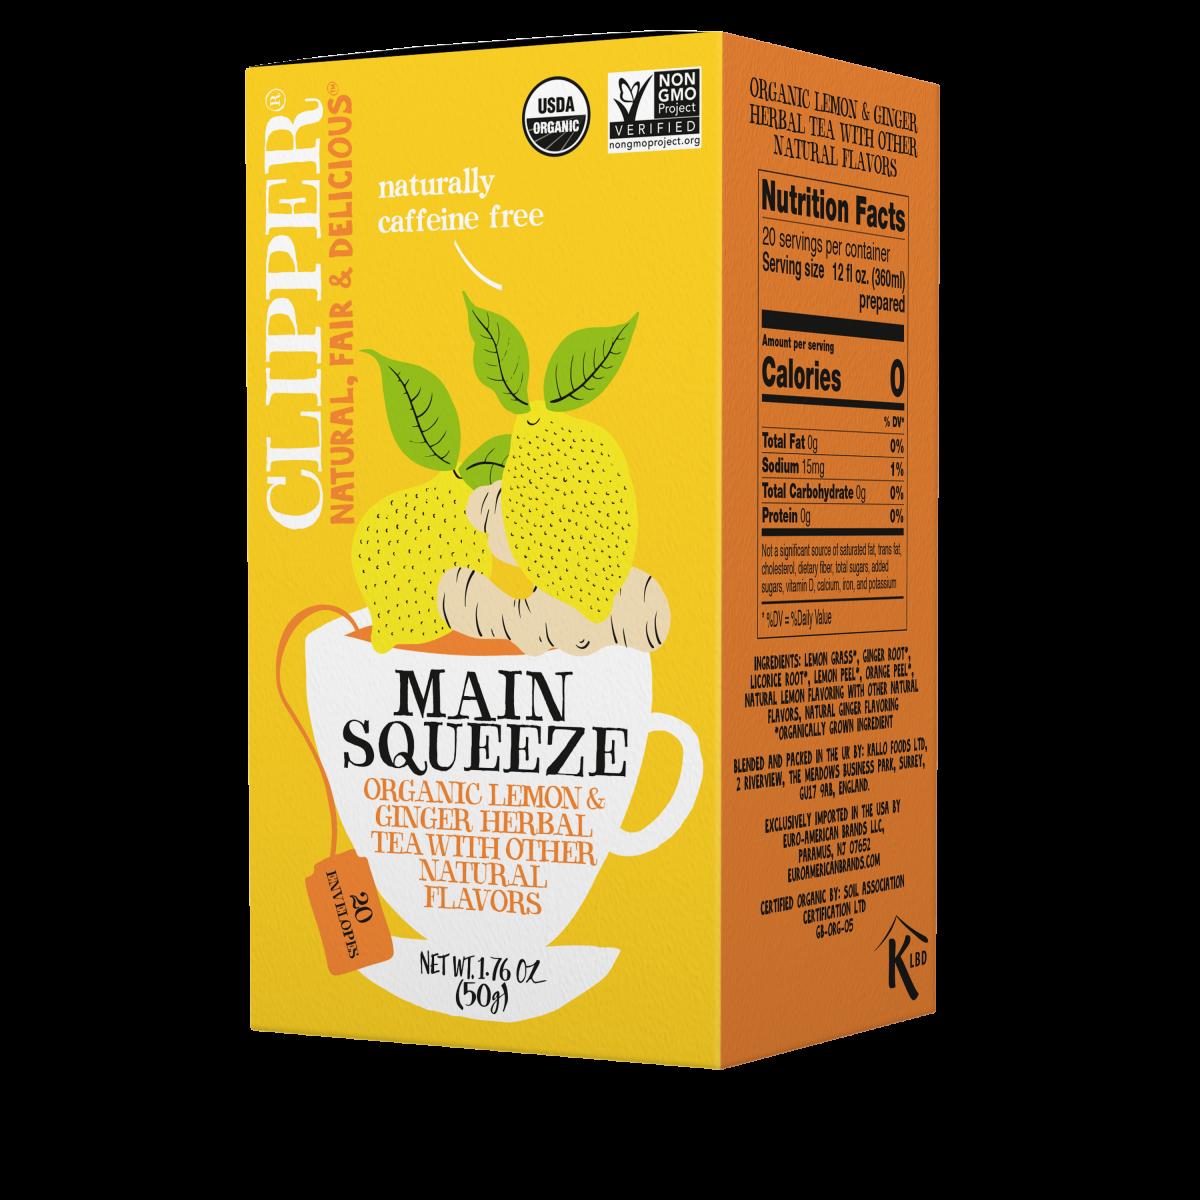 Main Squeeze organic herbal tea